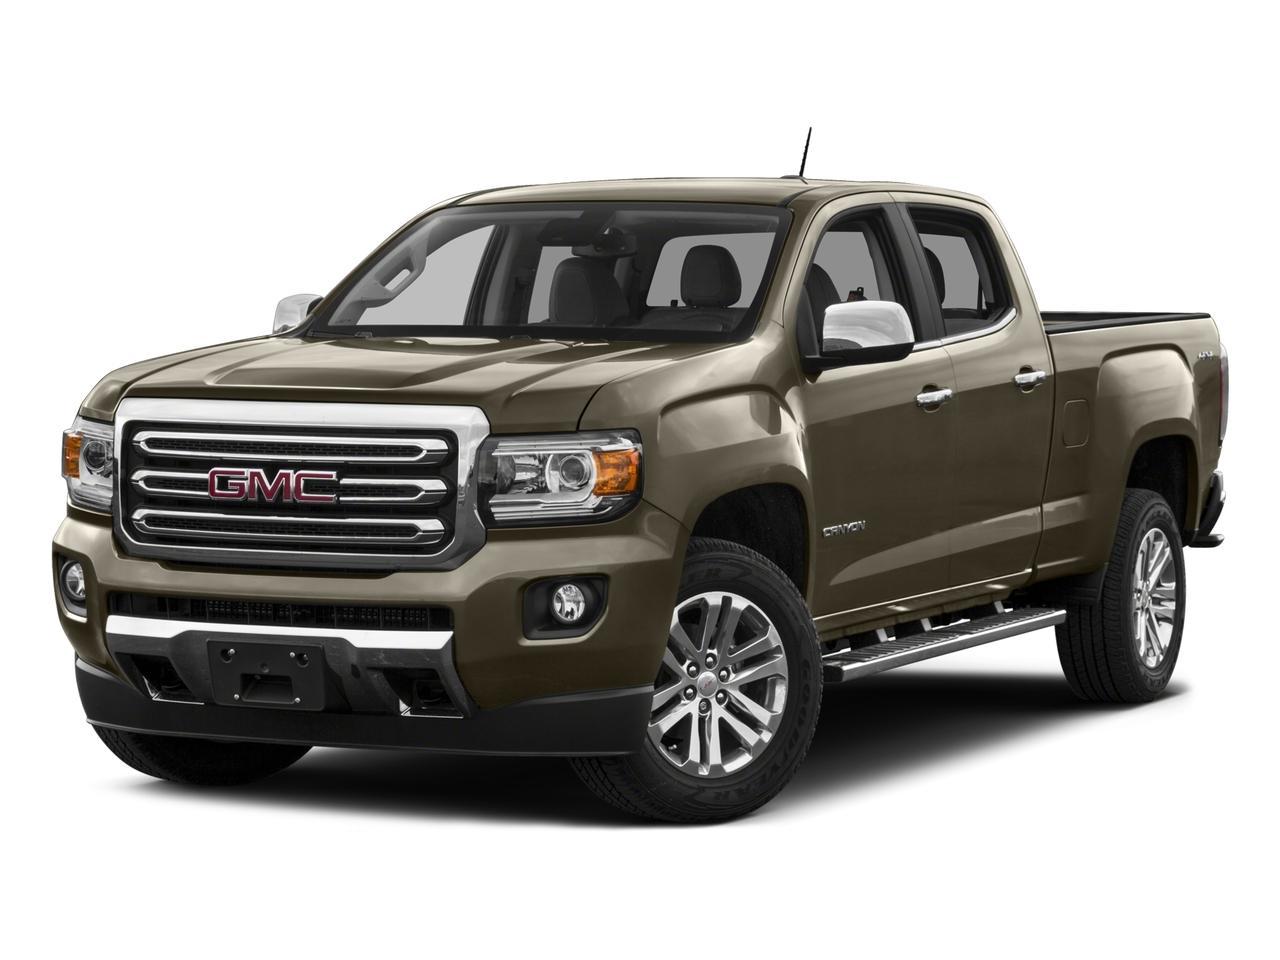 used gmc canyon vehicles for sale in flagstaff az terry marxen chevrolet cadillac terry marxen chevrolet cadillac